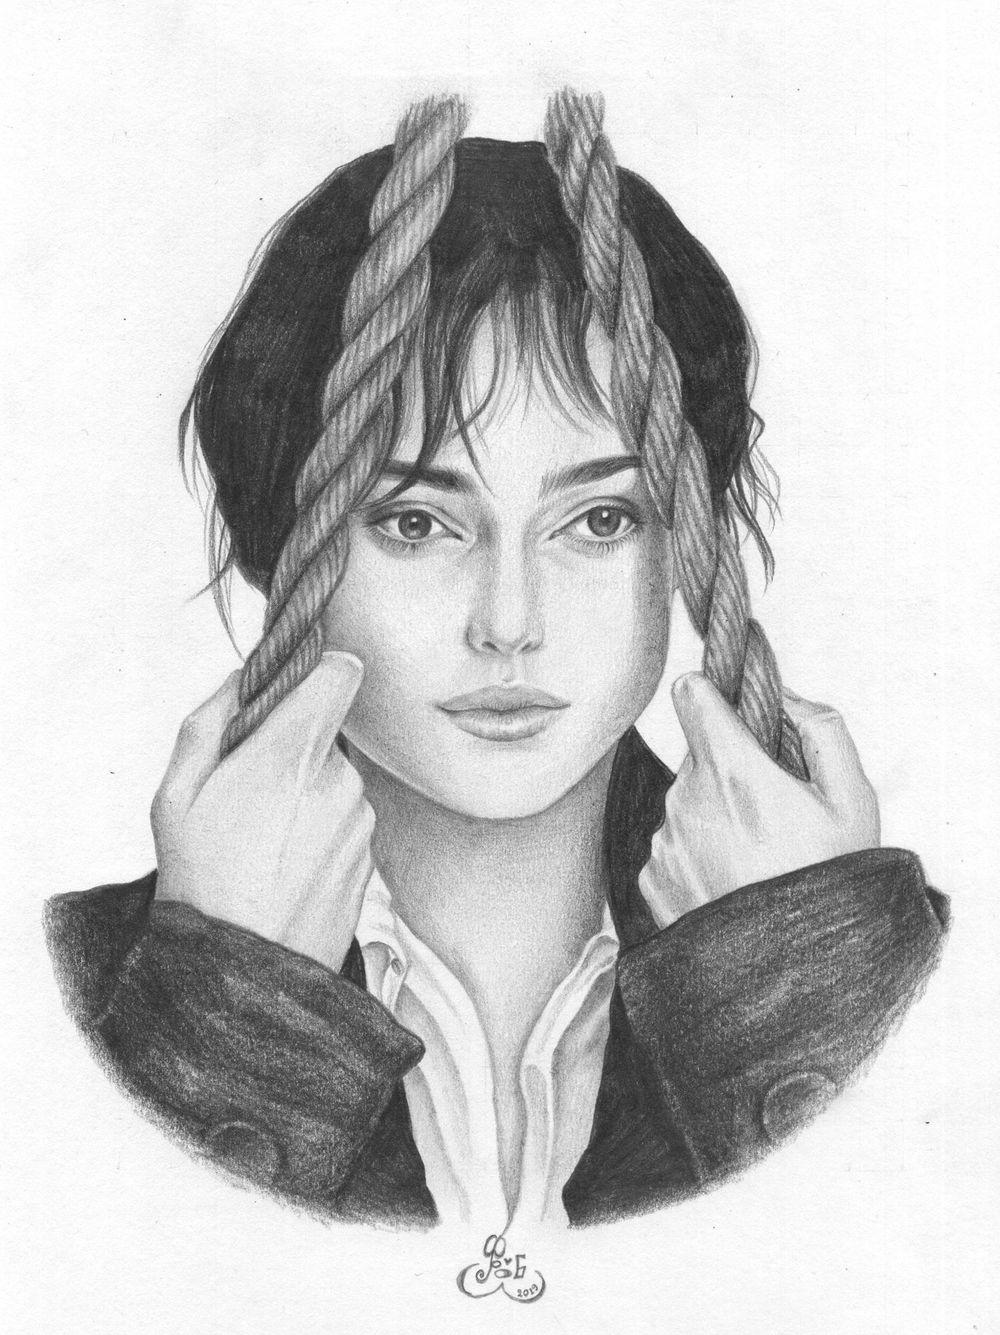 Portrait: Keira Knightley as Elizabeth Bennet - image 5 - student project